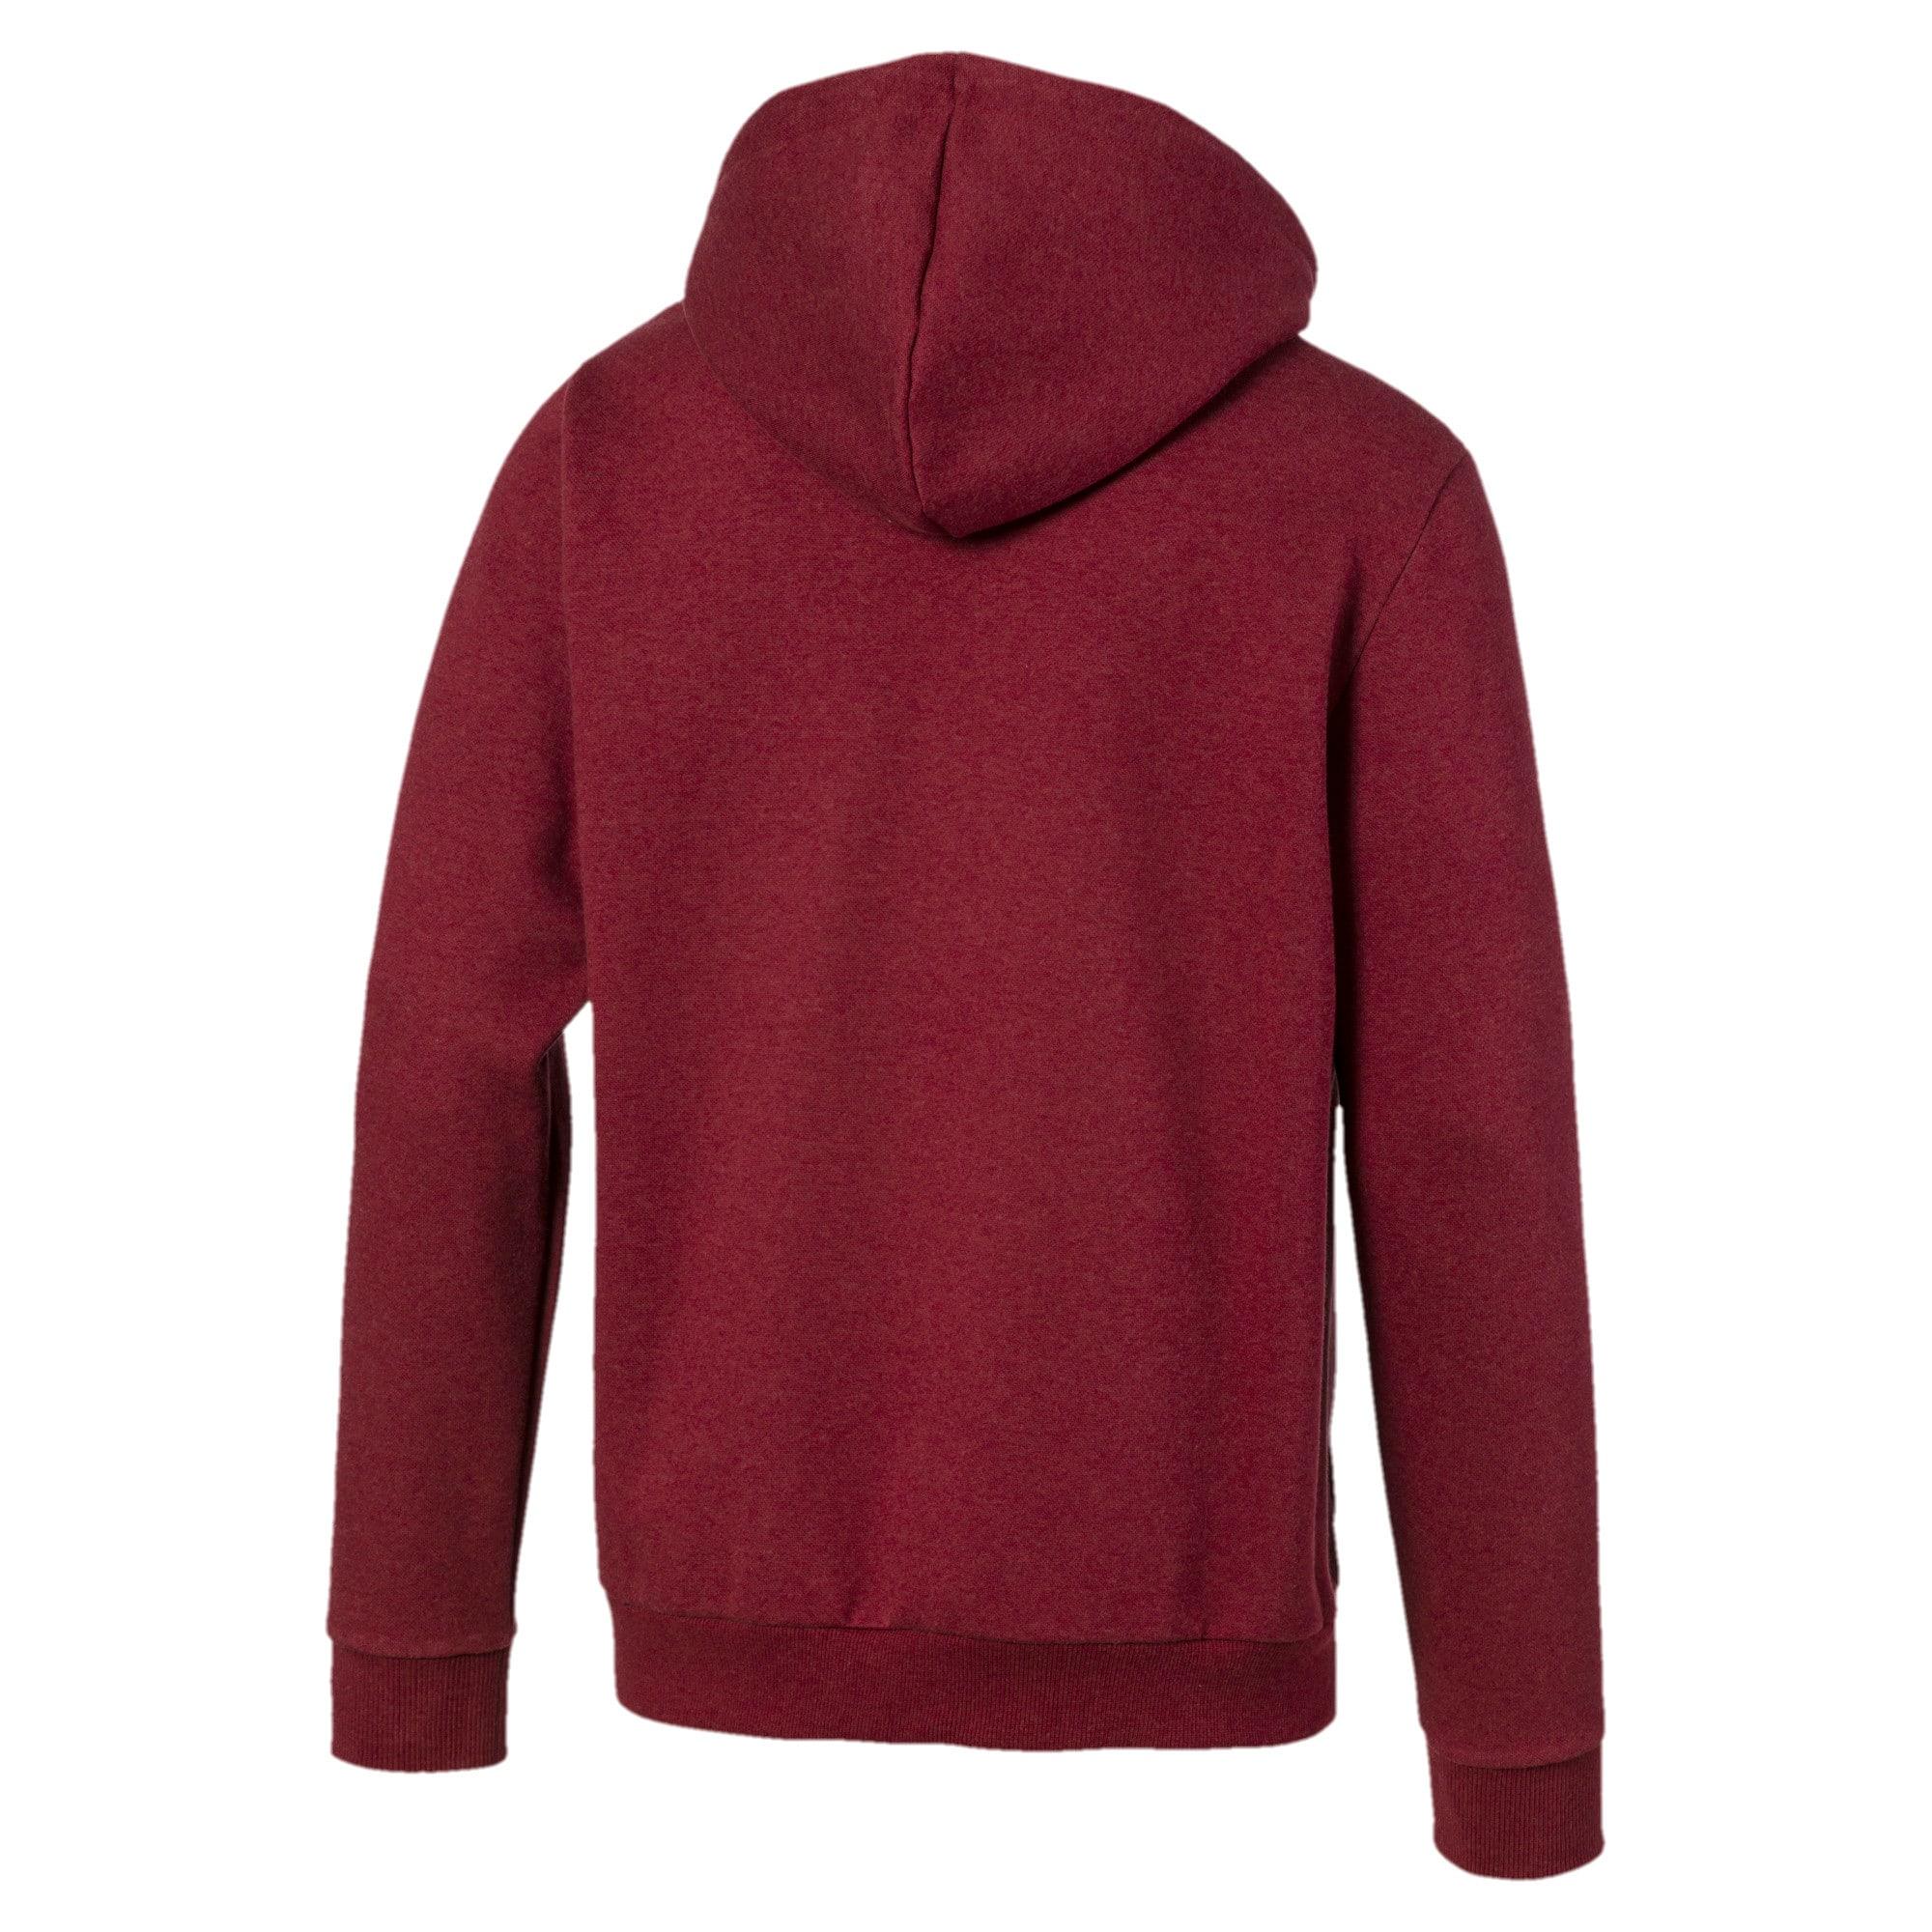 Thumbnail 5 of Essentials+ Men's Fleece Hooded Jacket, Rhubarb Heather, medium